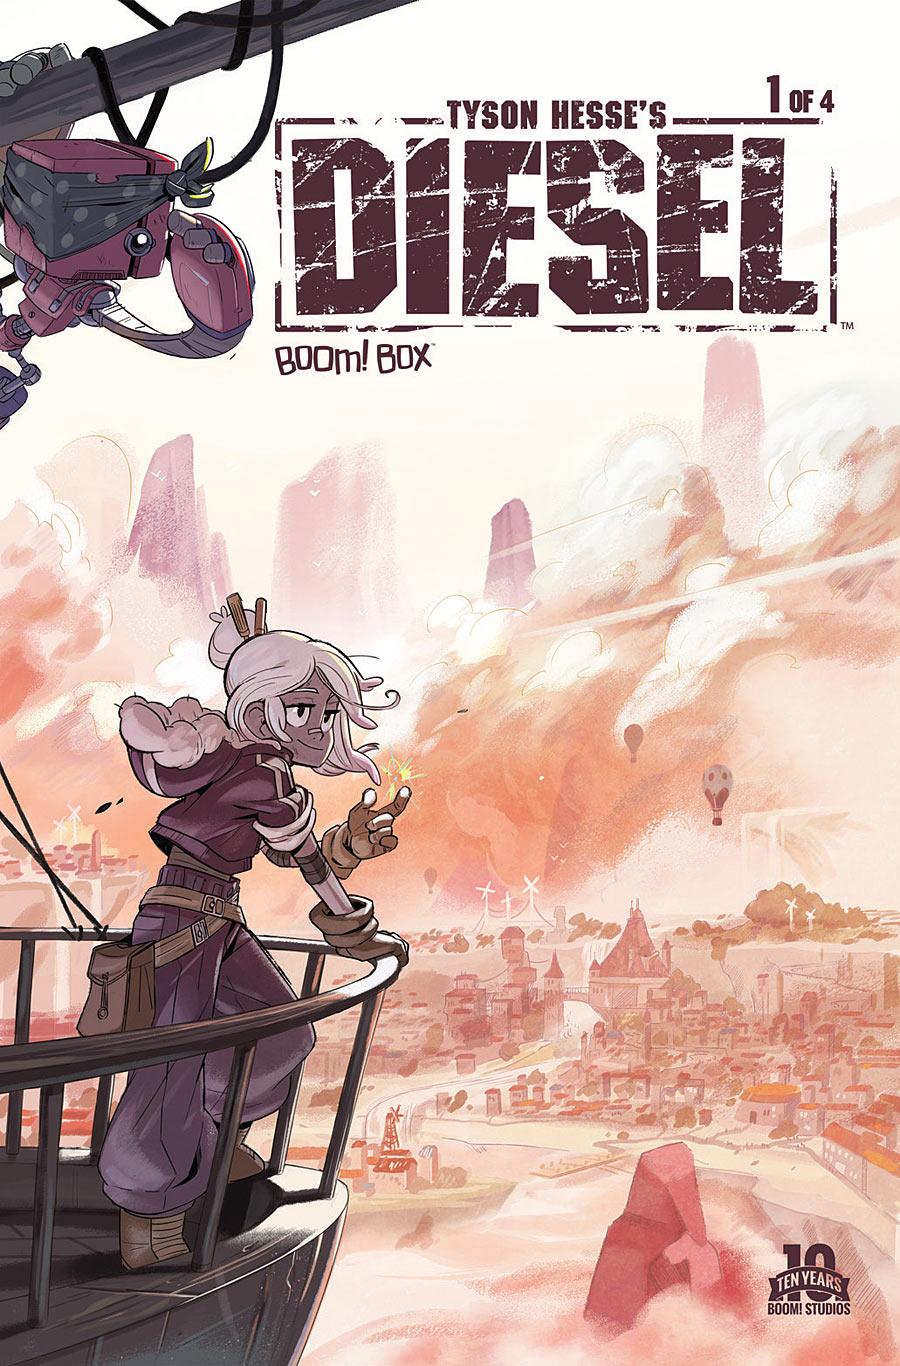 Tyson Hesse's Diesel